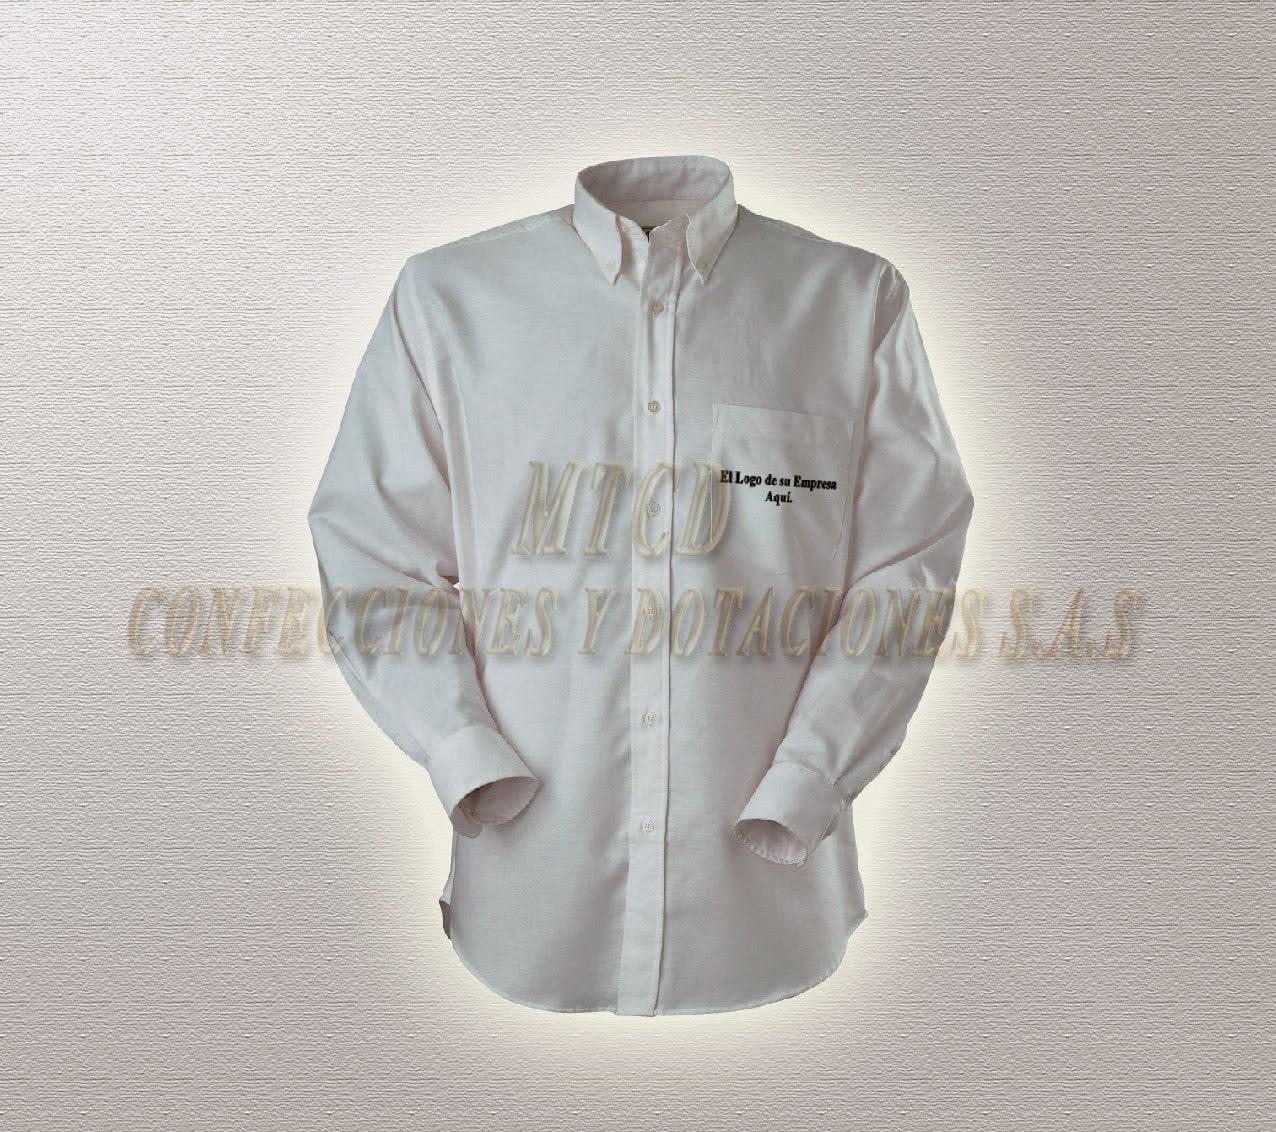 Camisa para hombre bordada